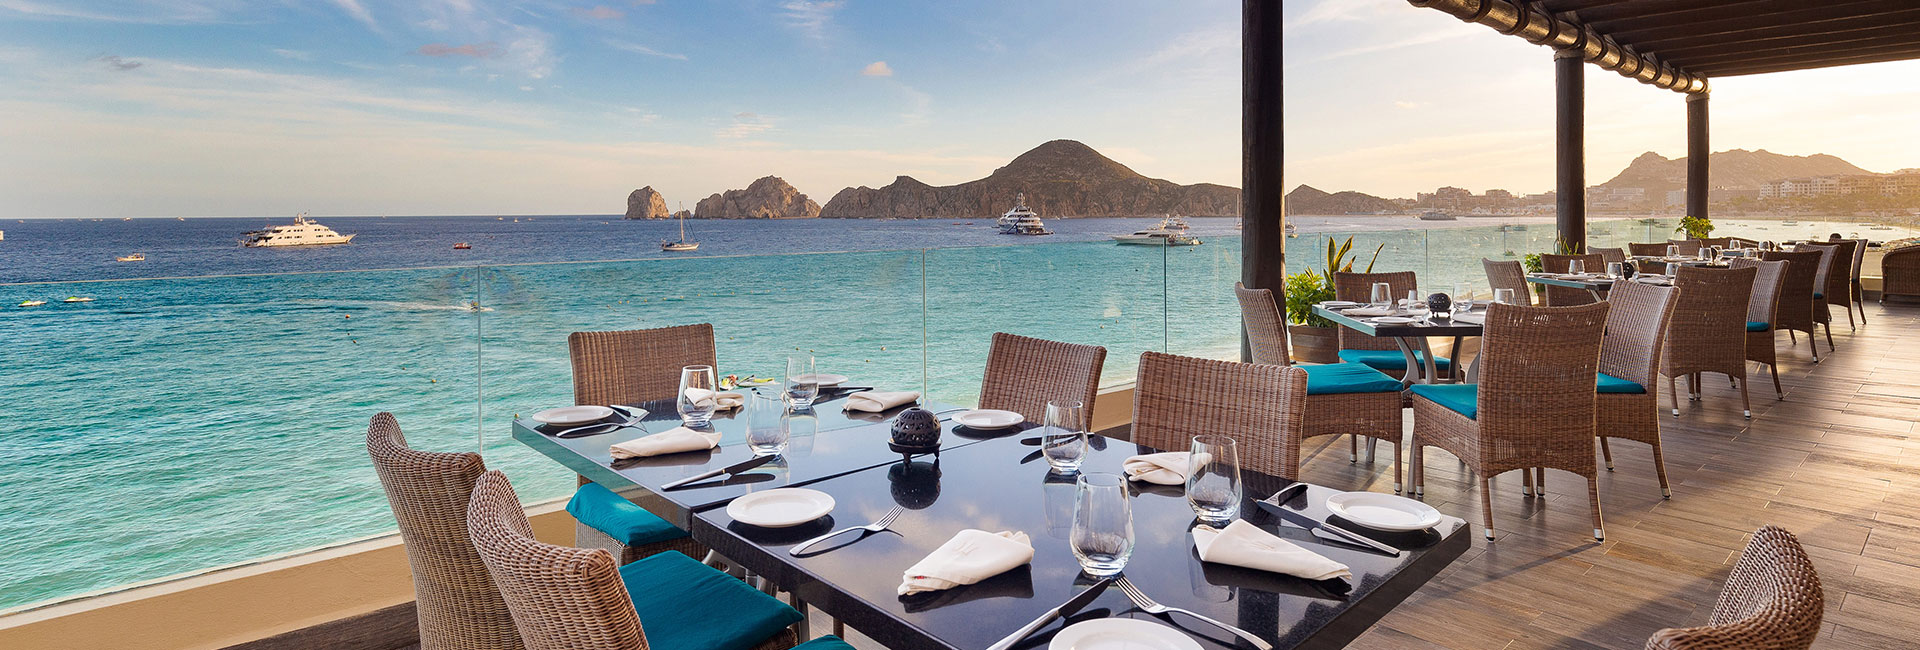 Neptune Restaurant At Villa Del Arco Cabo San Lucas